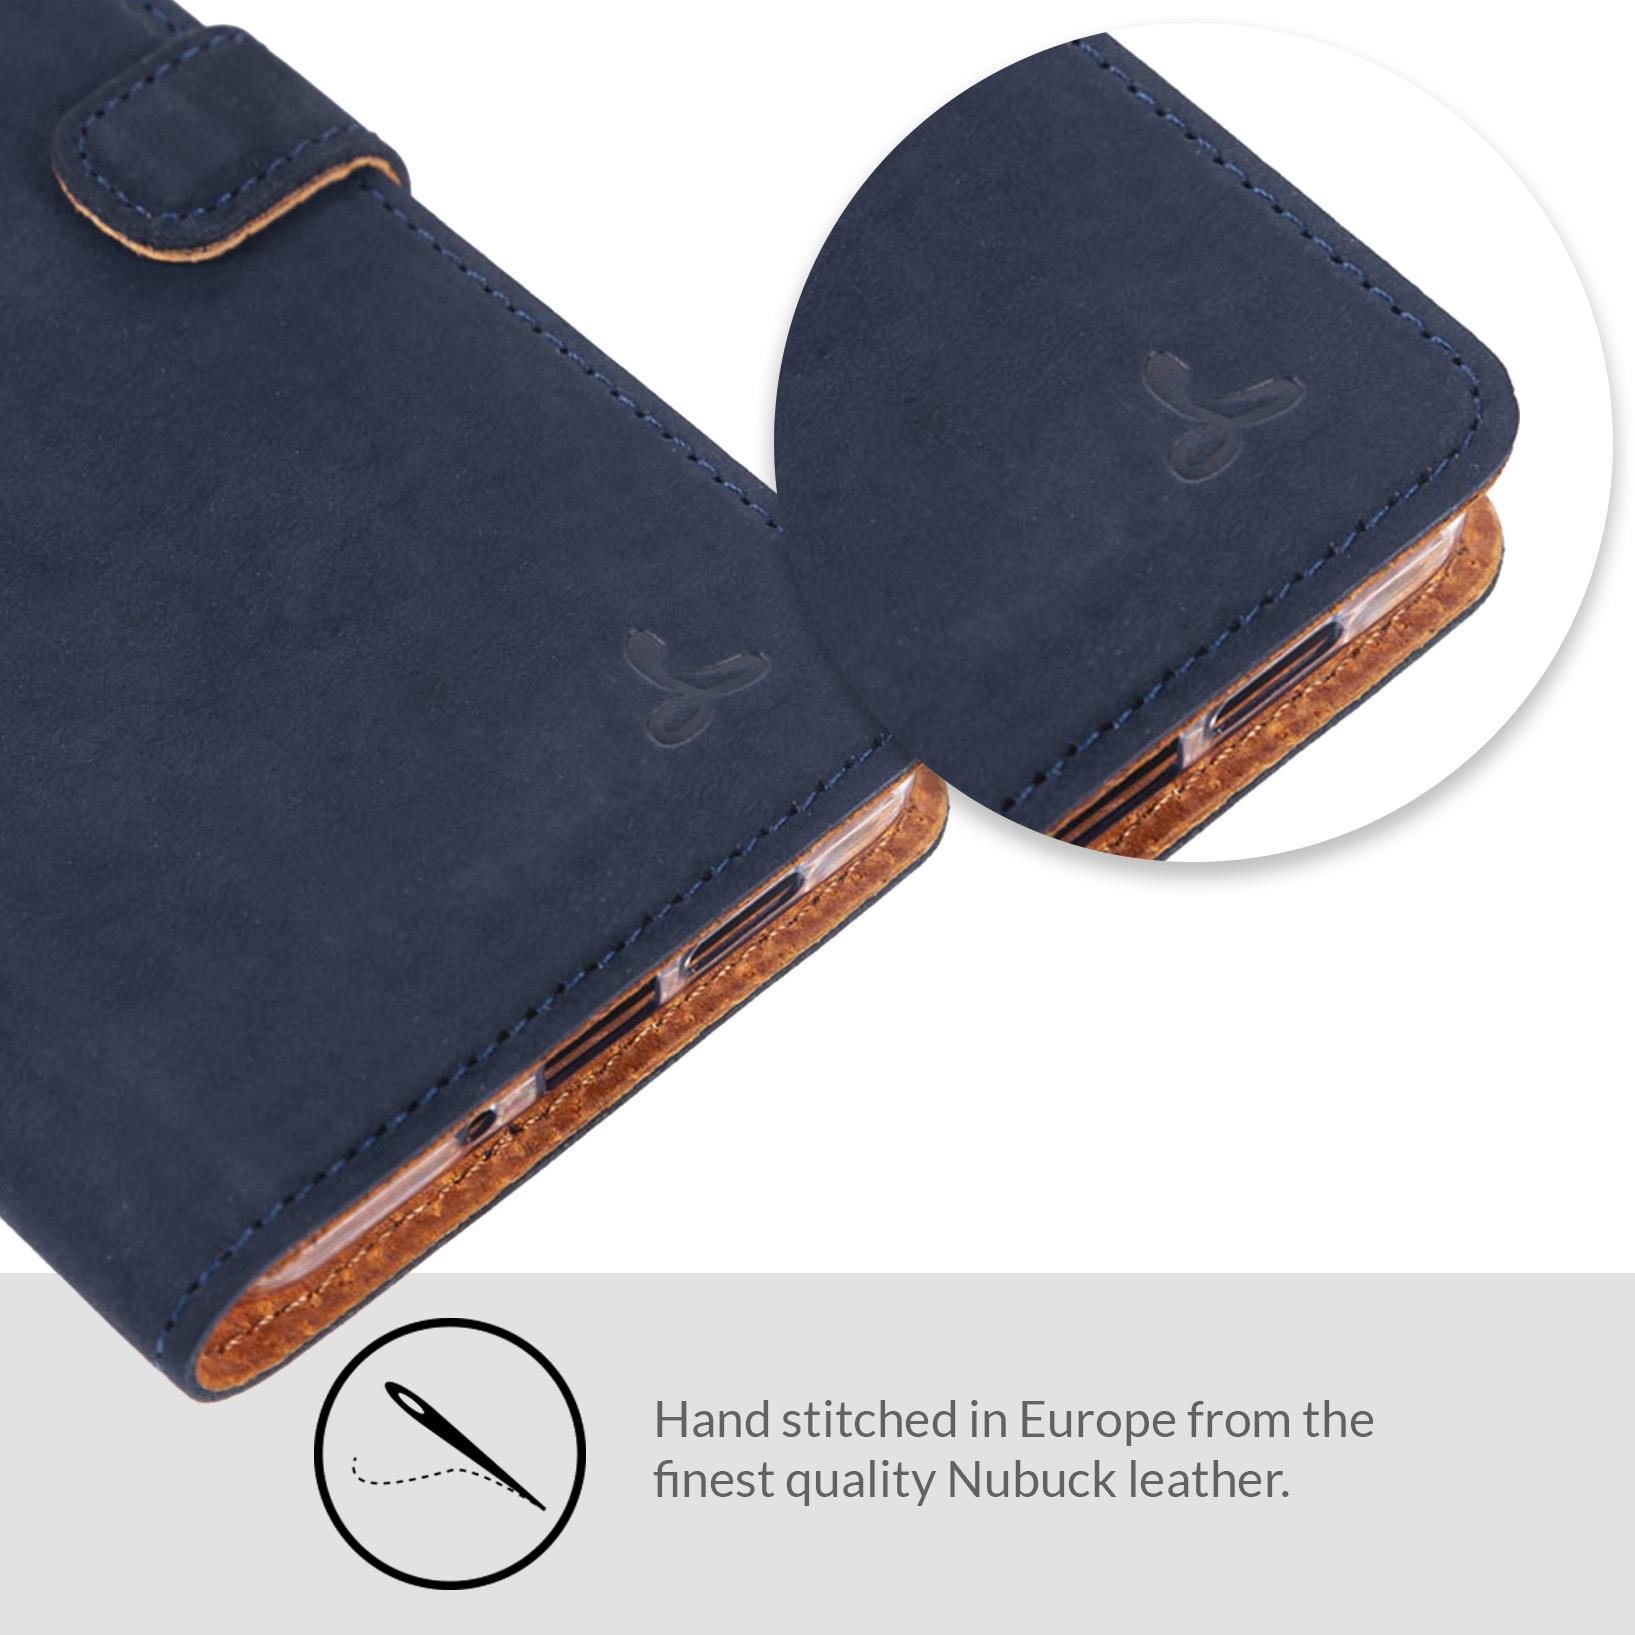 Snakehive-Huawei-P30-Pro-Premium-Genuine-Leather-Wallet-Case-w-Card-Slots thumbnail 13